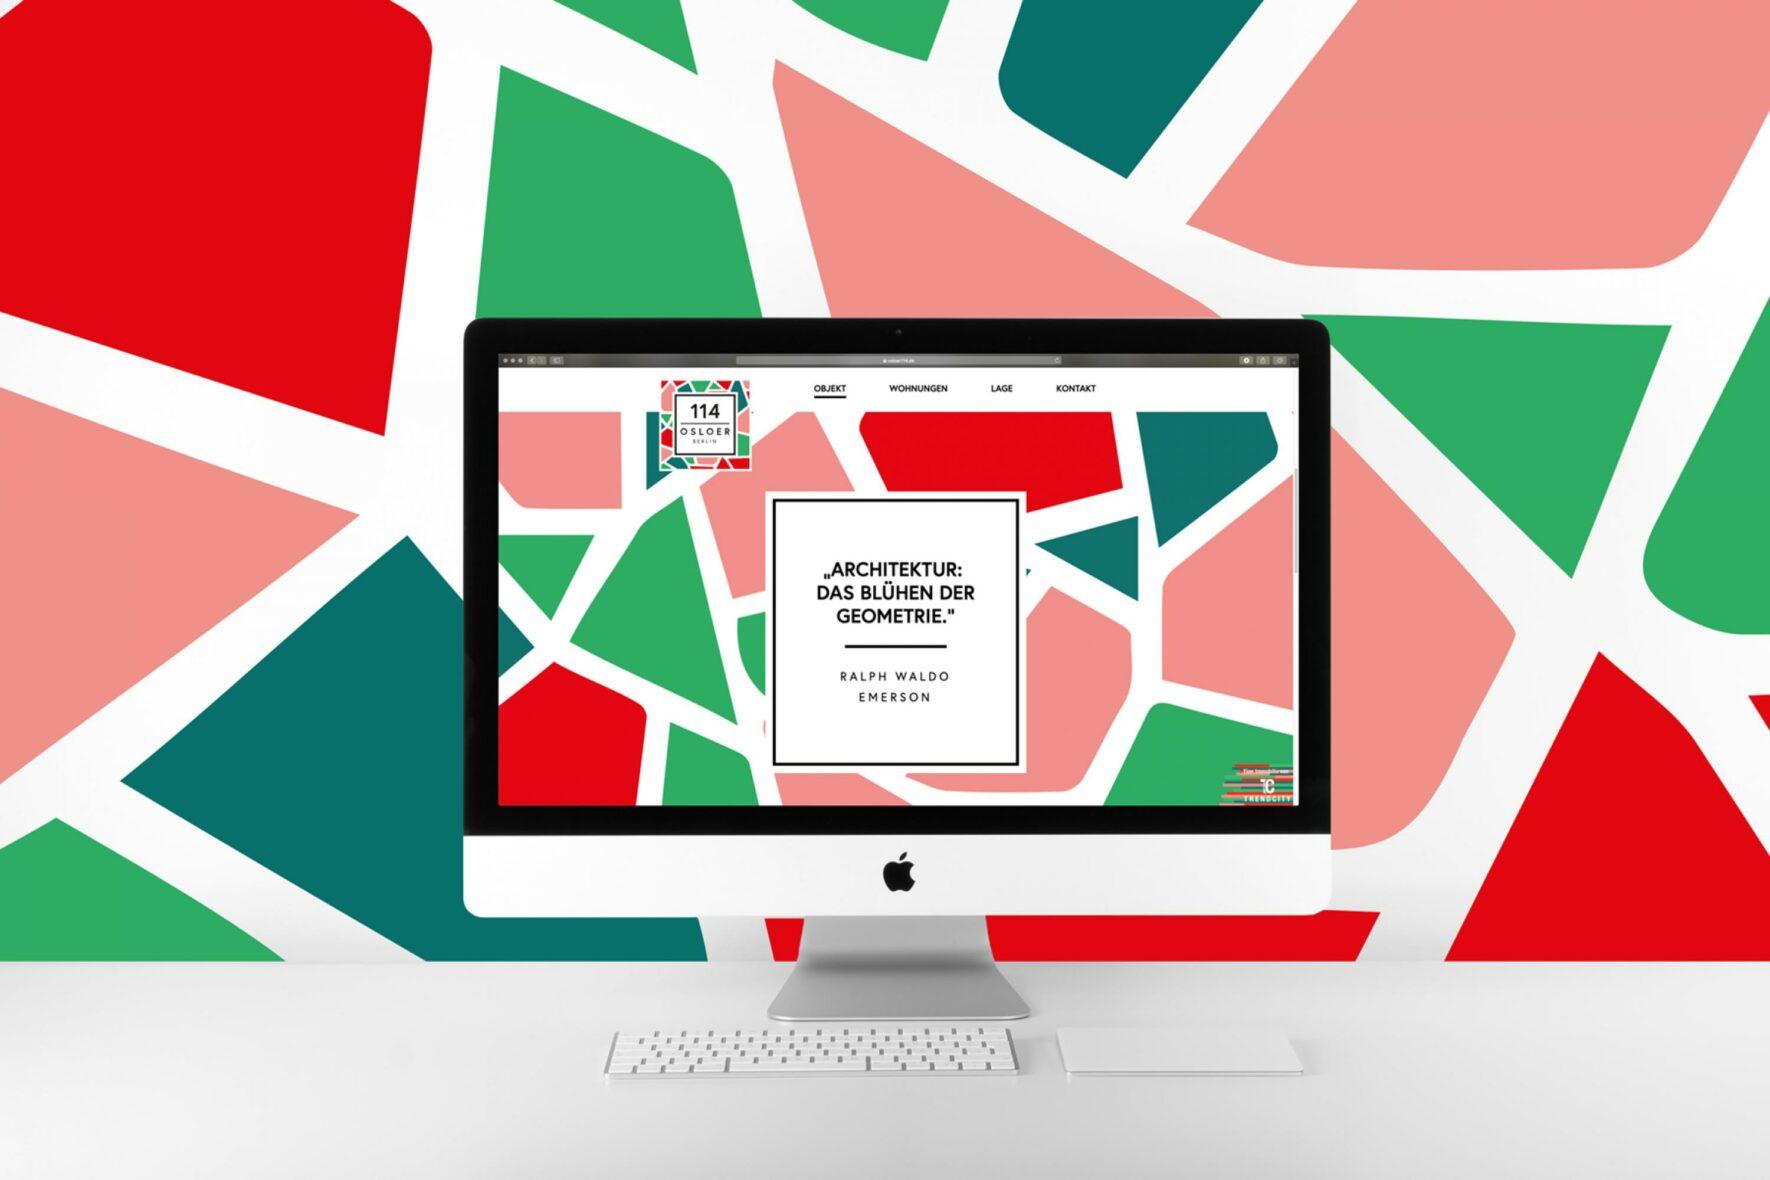 Webdesign-Osloer114-Trendcity-Immobilien-FORMLOS-Berlin-Design-2